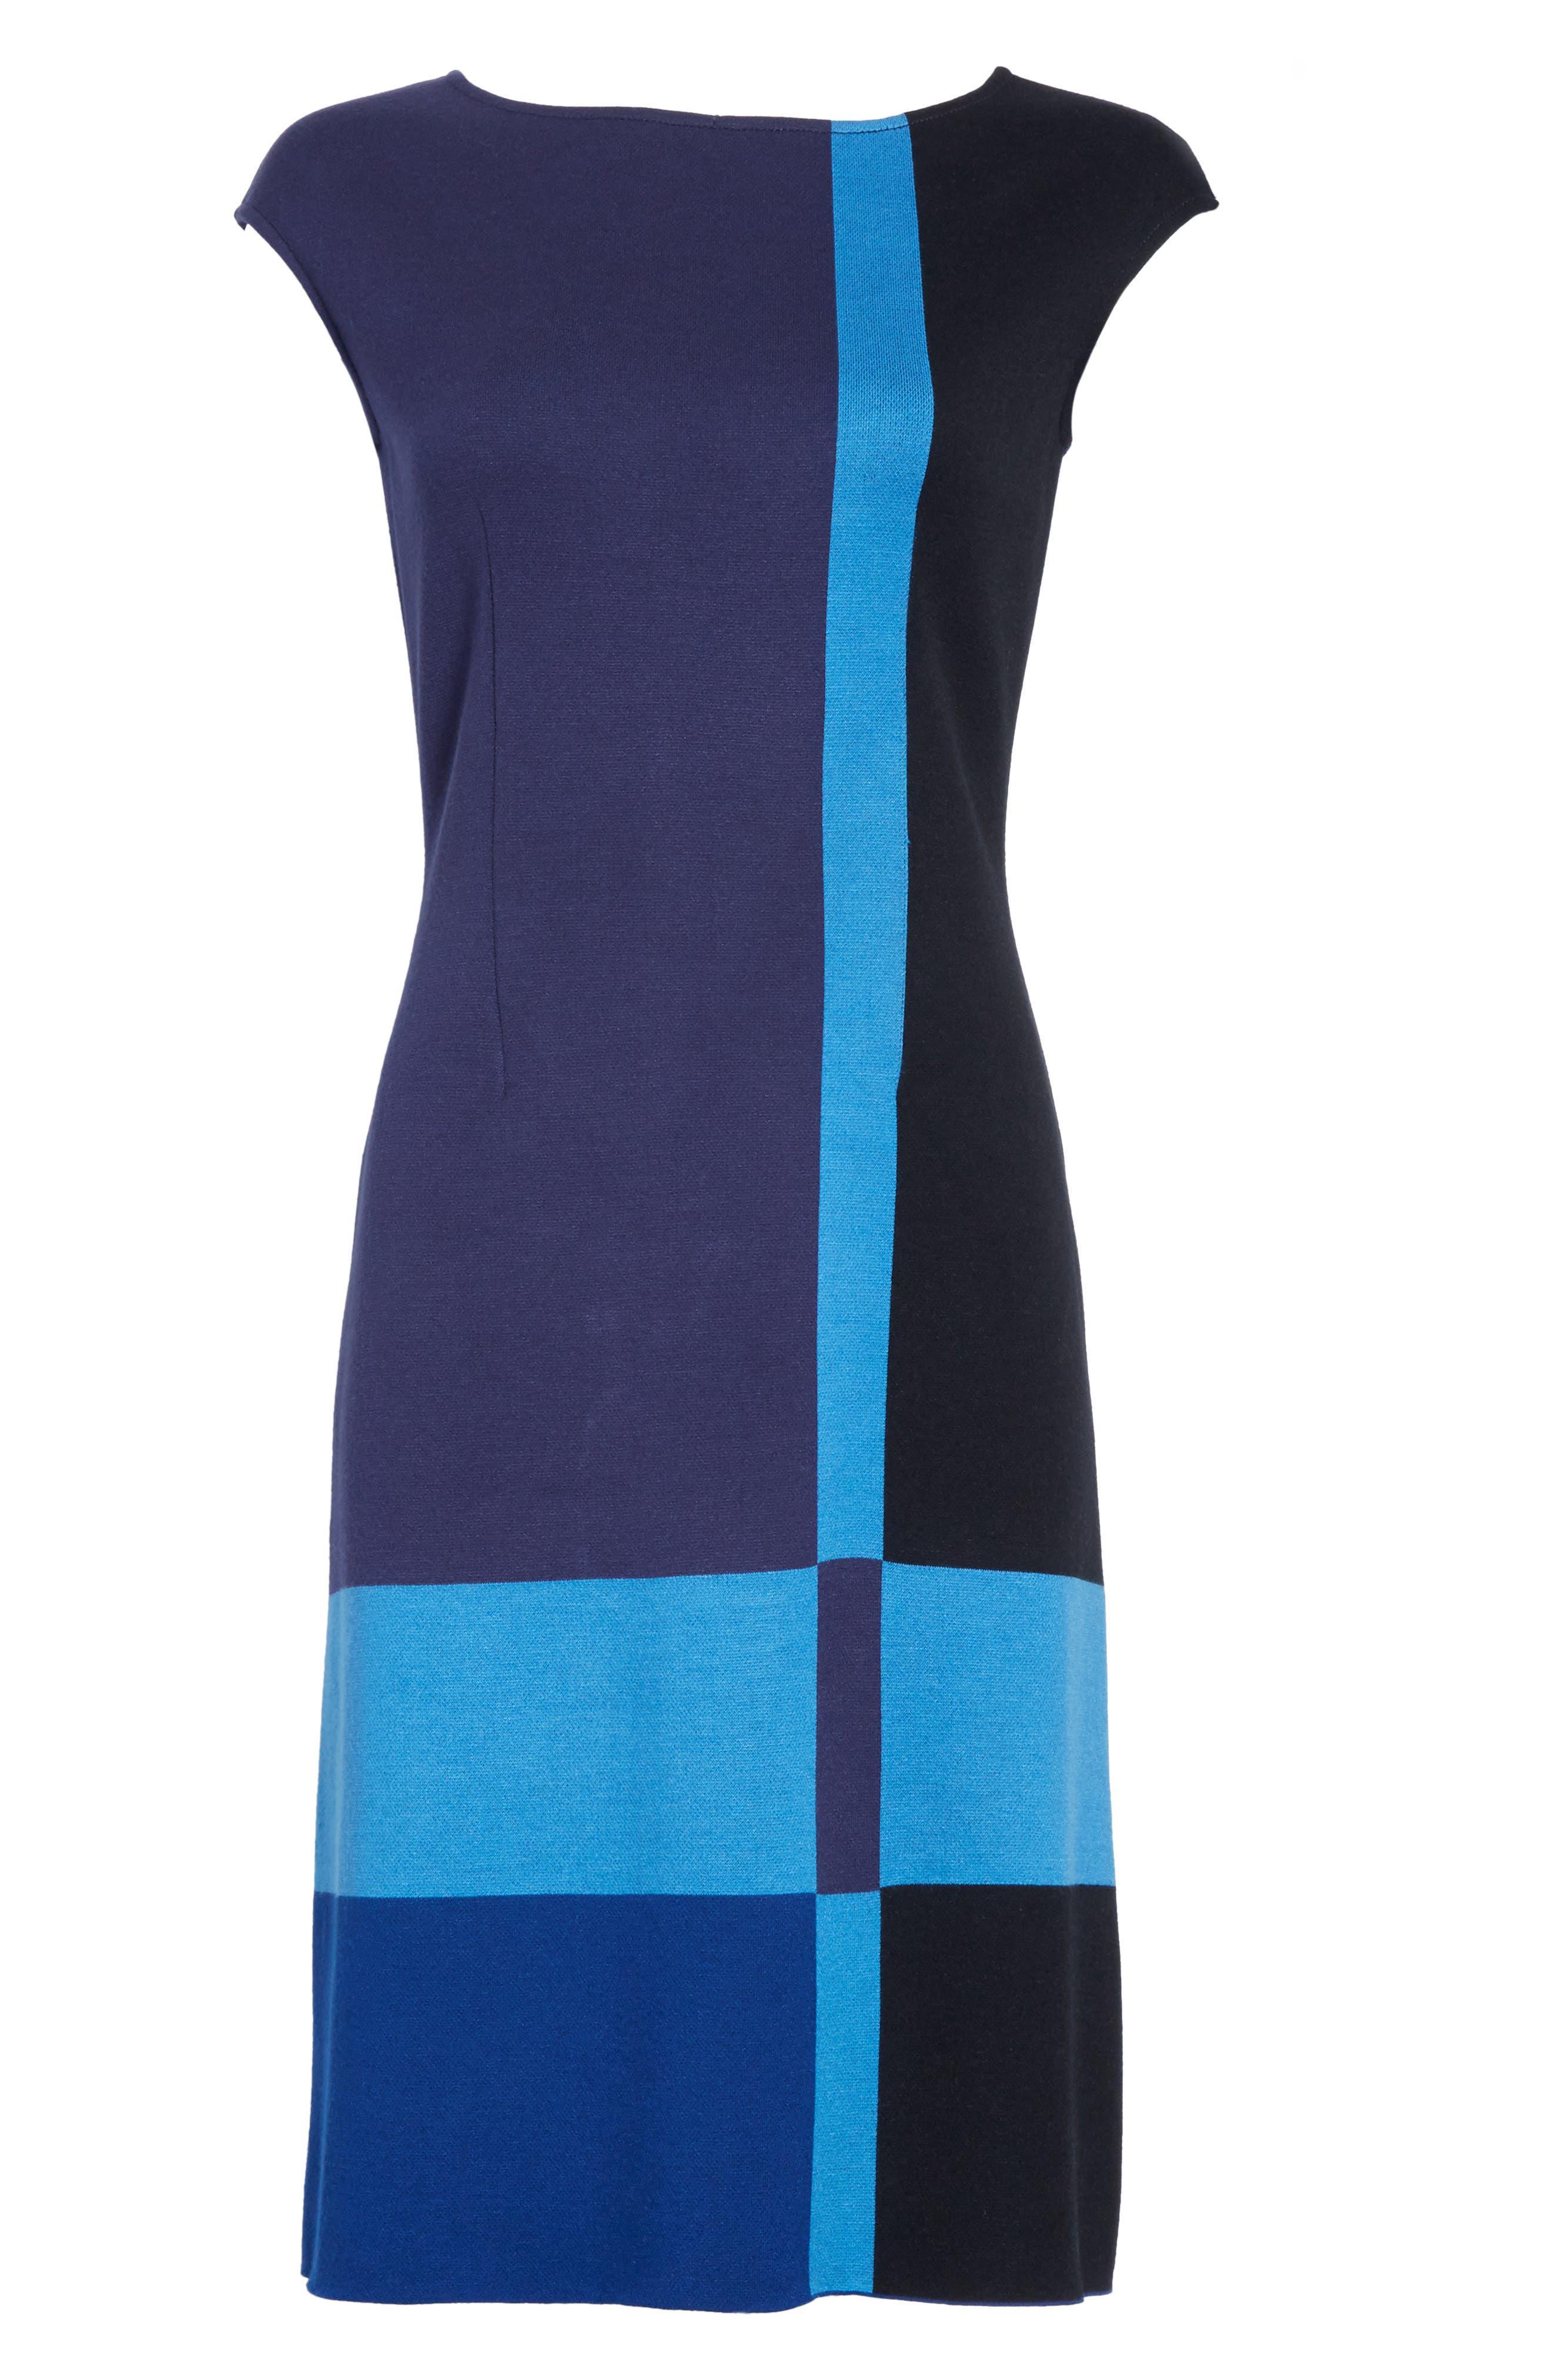 Colorblock Milano Knit Dress,                             Alternate thumbnail 6, color,                             Navy Multi